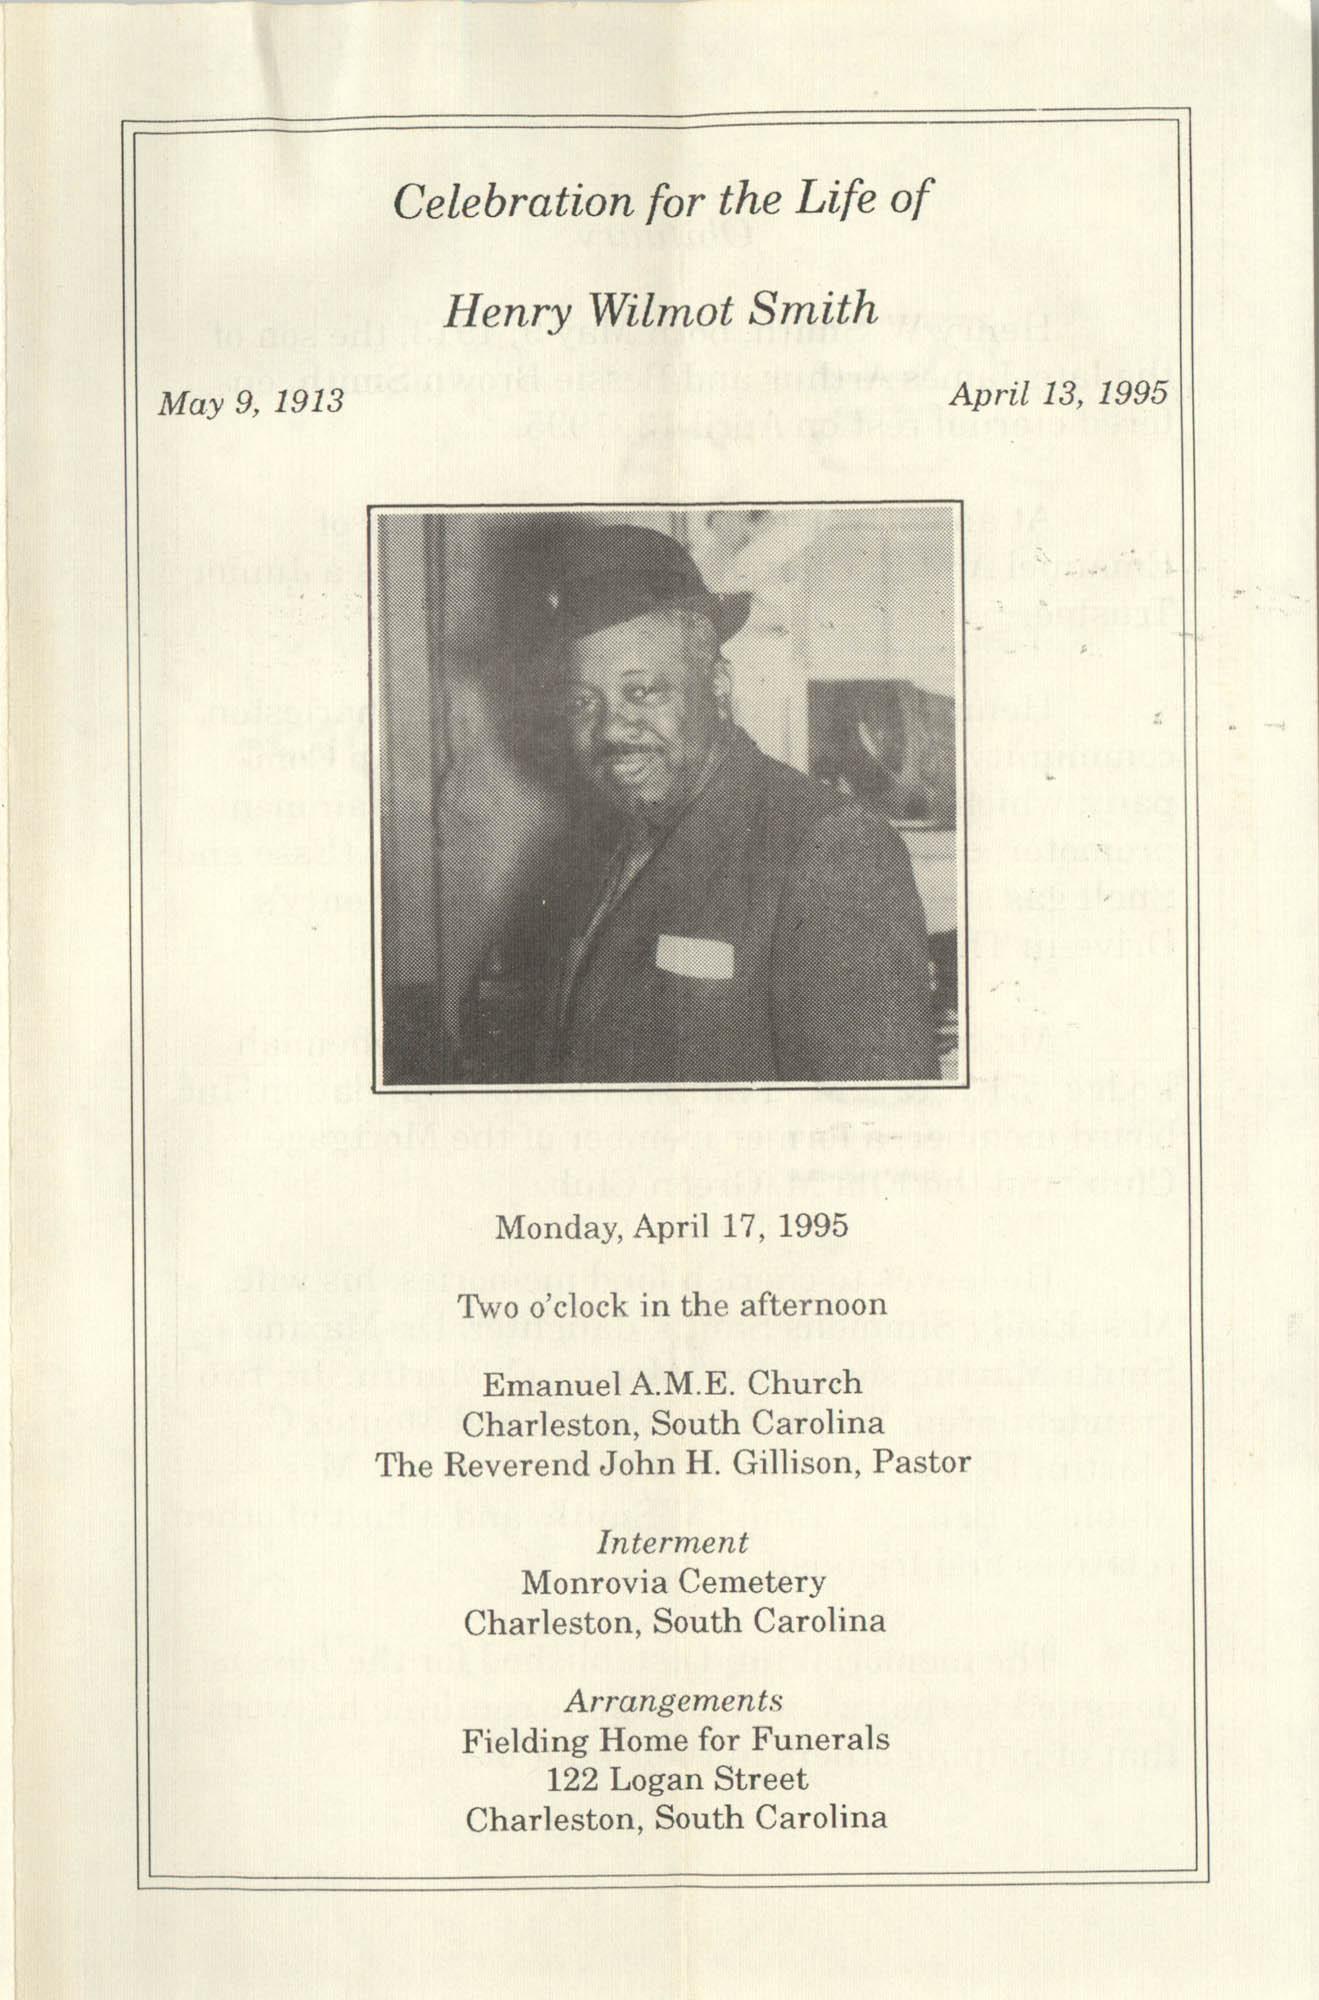 Program, Celebration for the Life of Henry Wilmot Smith